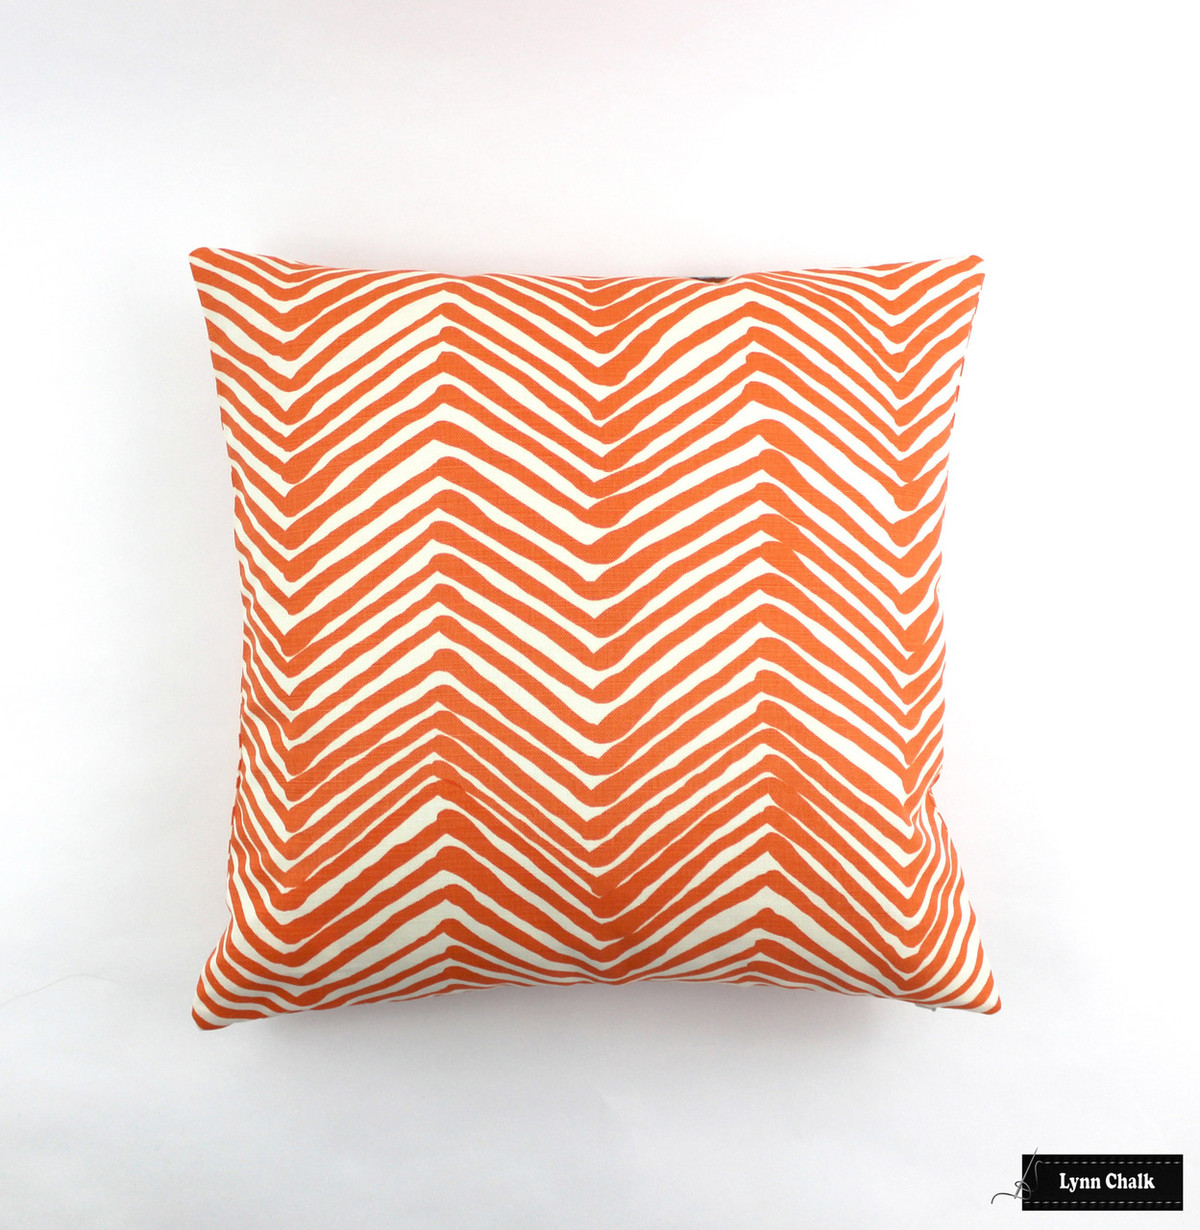 Quadrille Alan Campbell Zig Zag Pillow In Orange On Tint